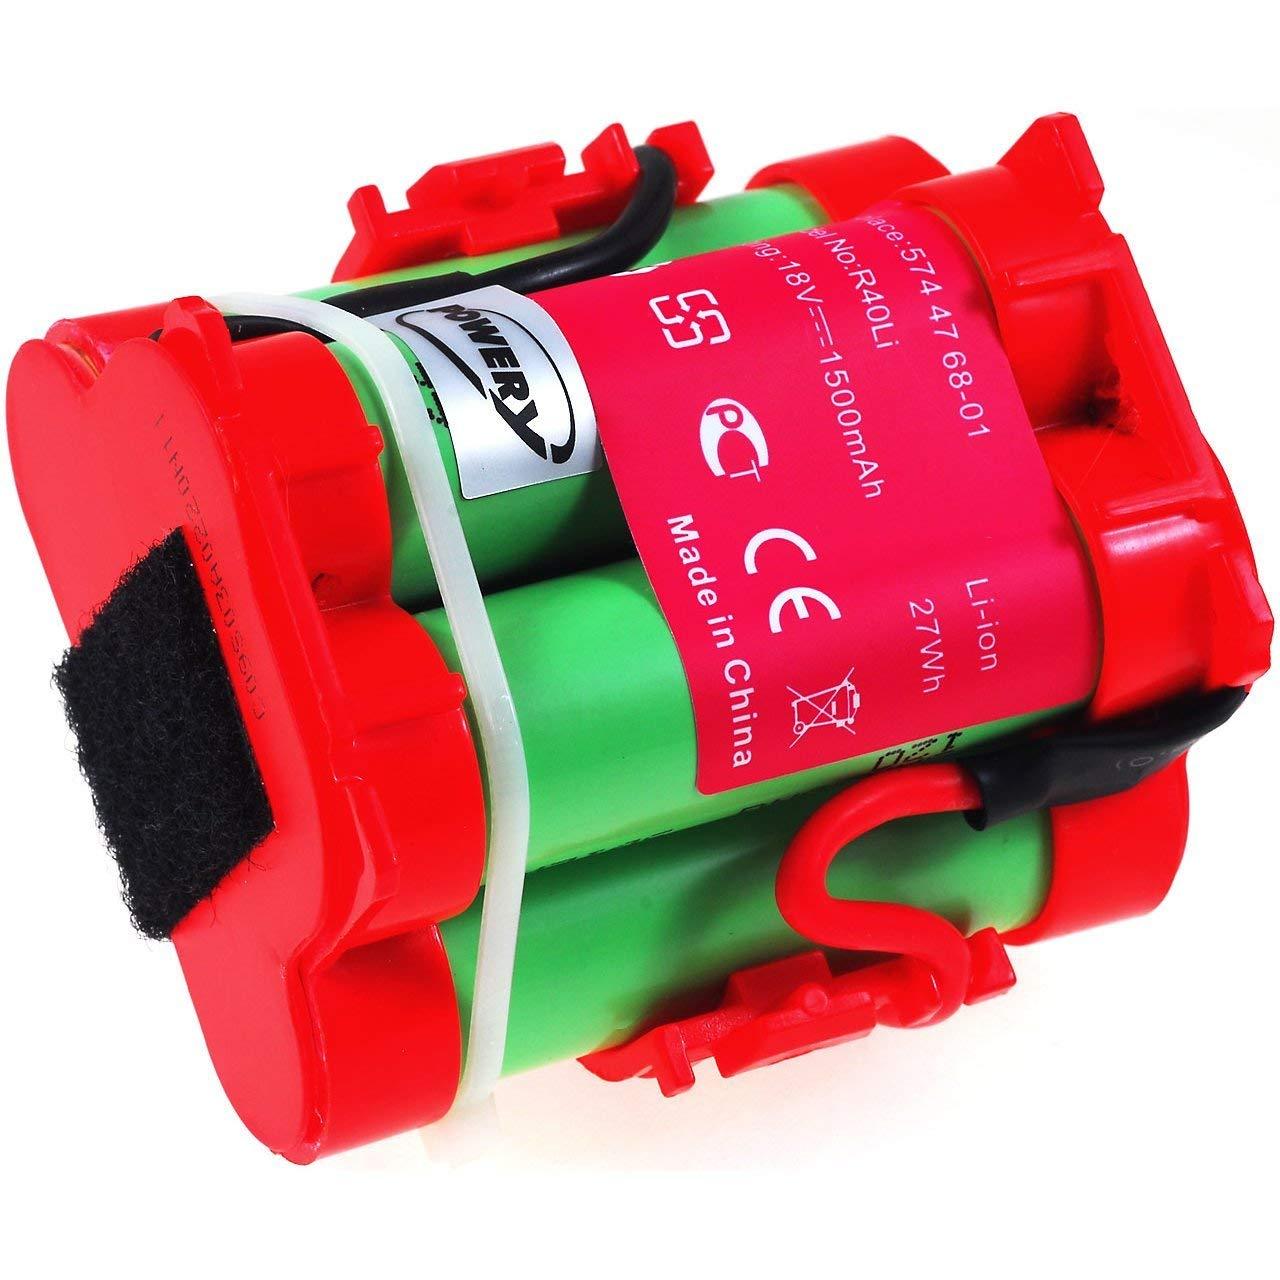 Batería para Robot Cortacésped Husqvarna Automower 308 ...